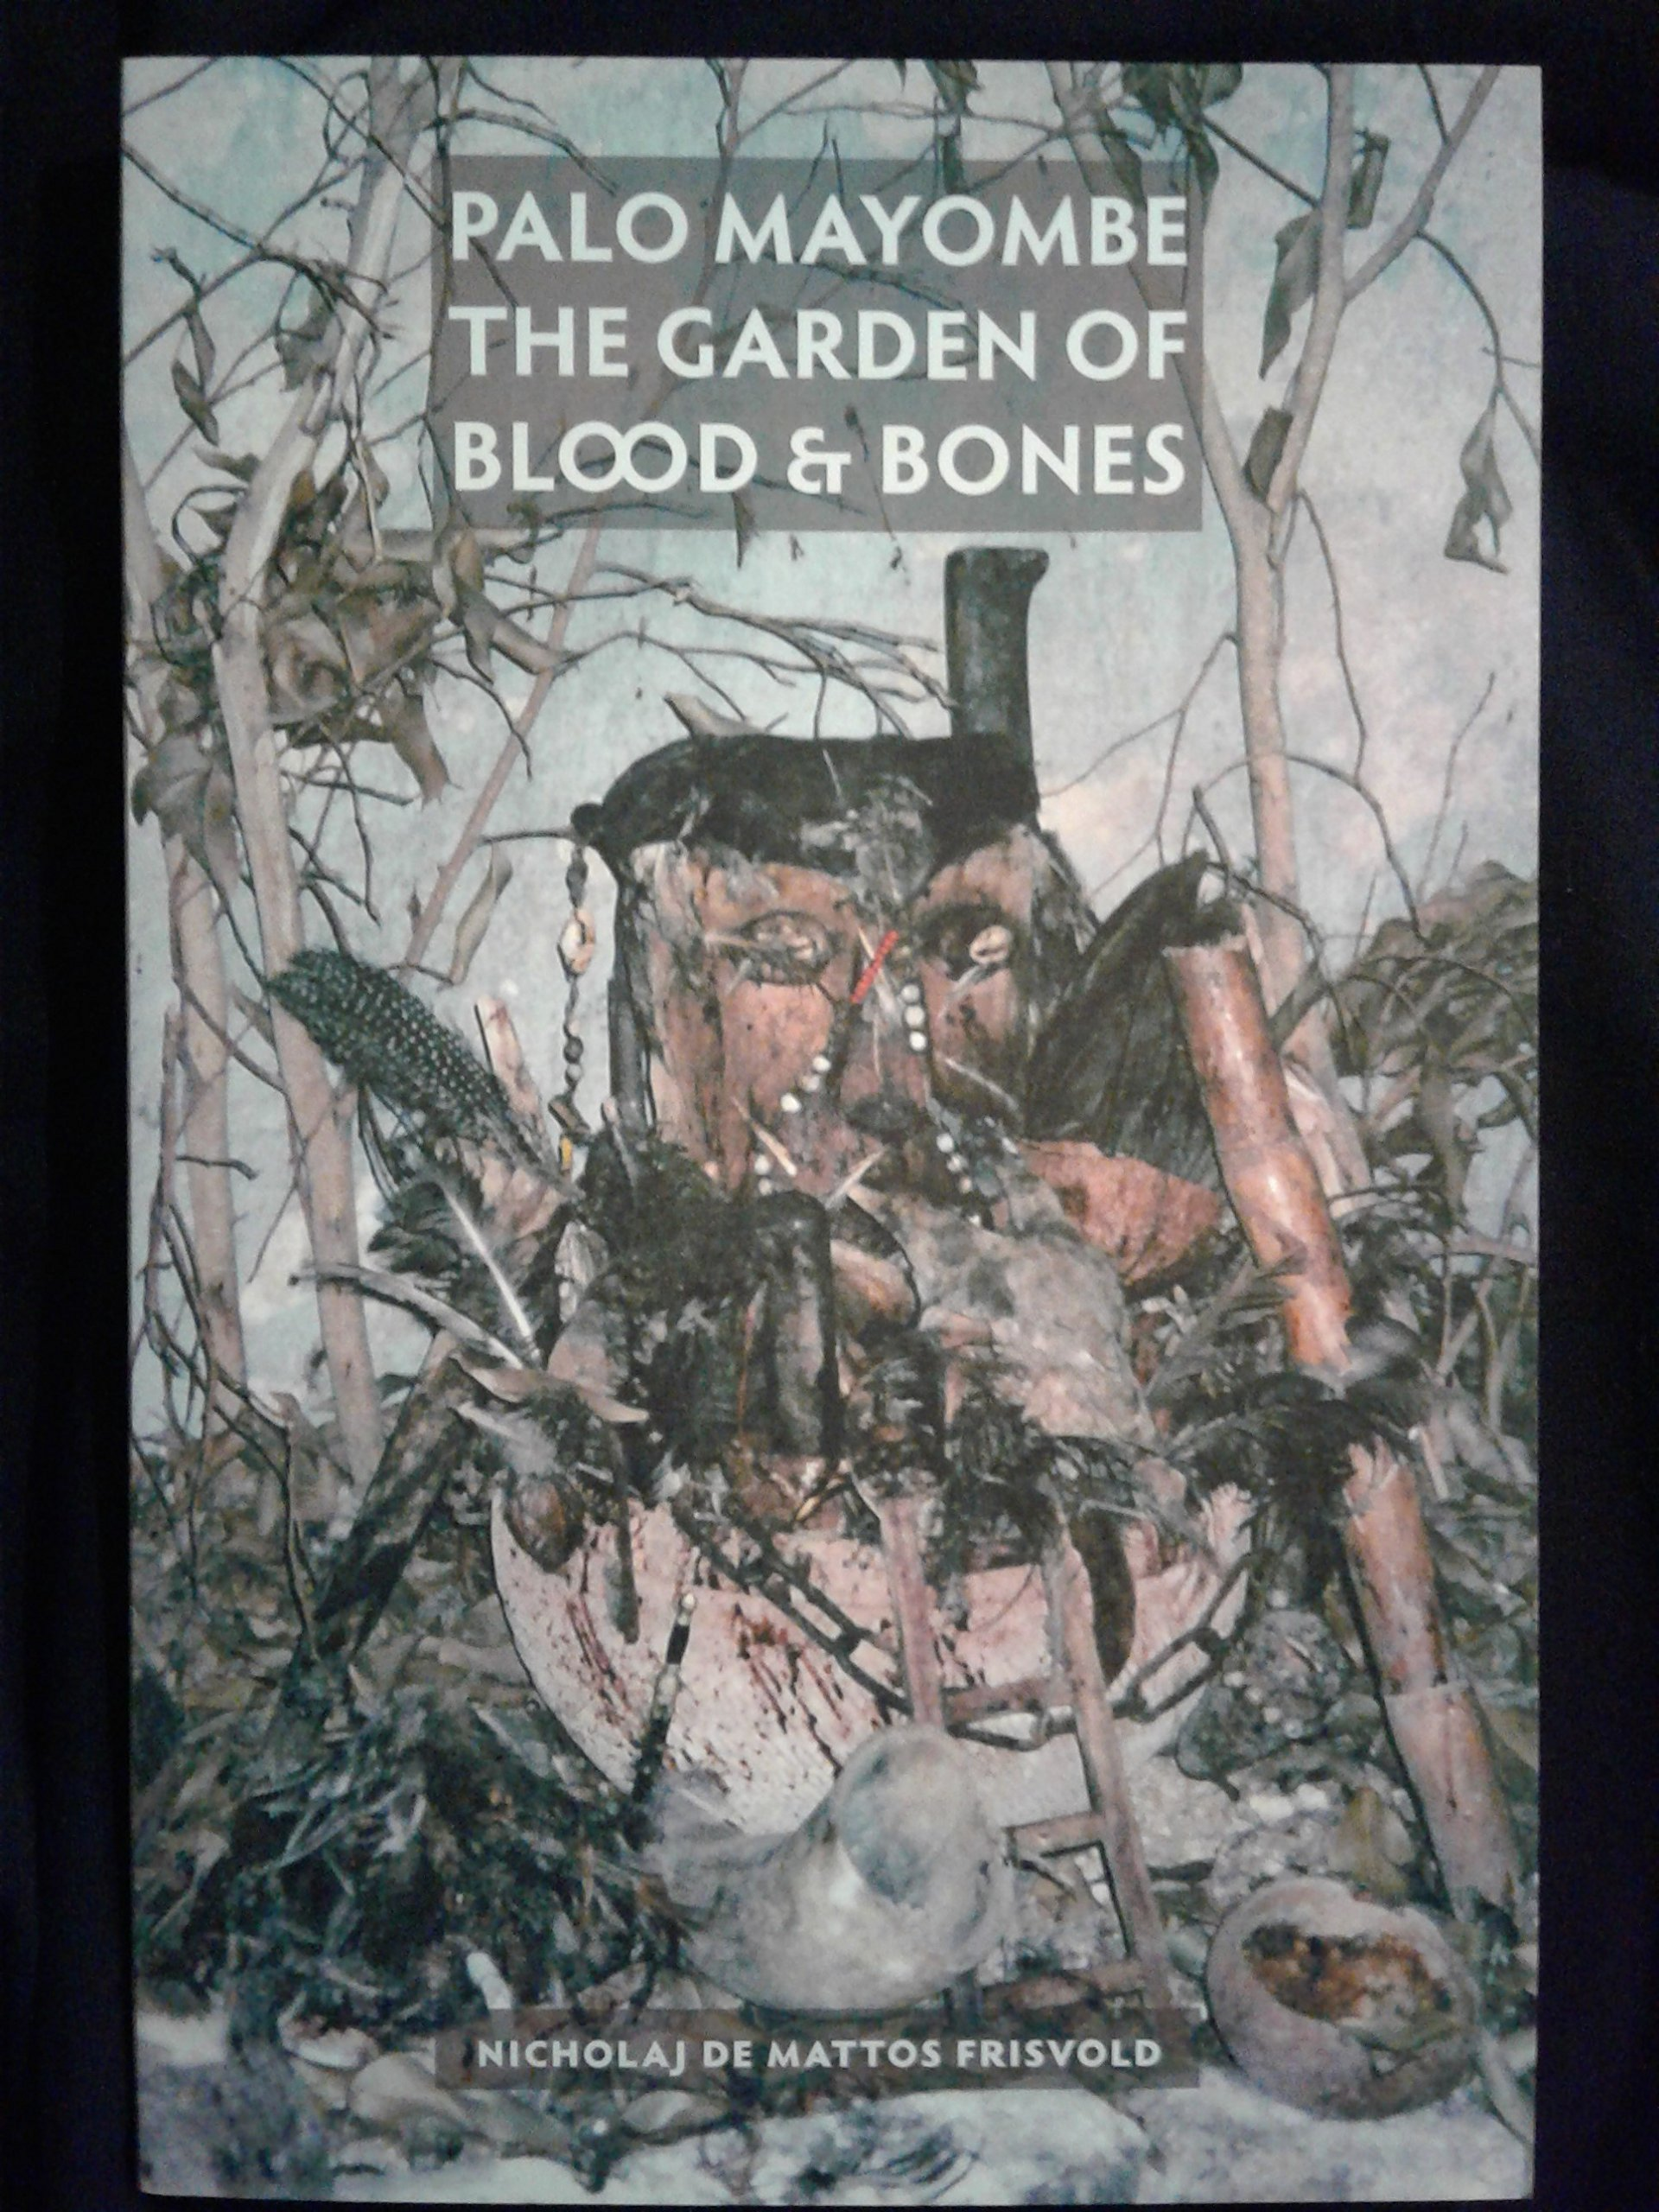 Palo Mayombe: The Garden of Blood and Bones: Nicholaj de